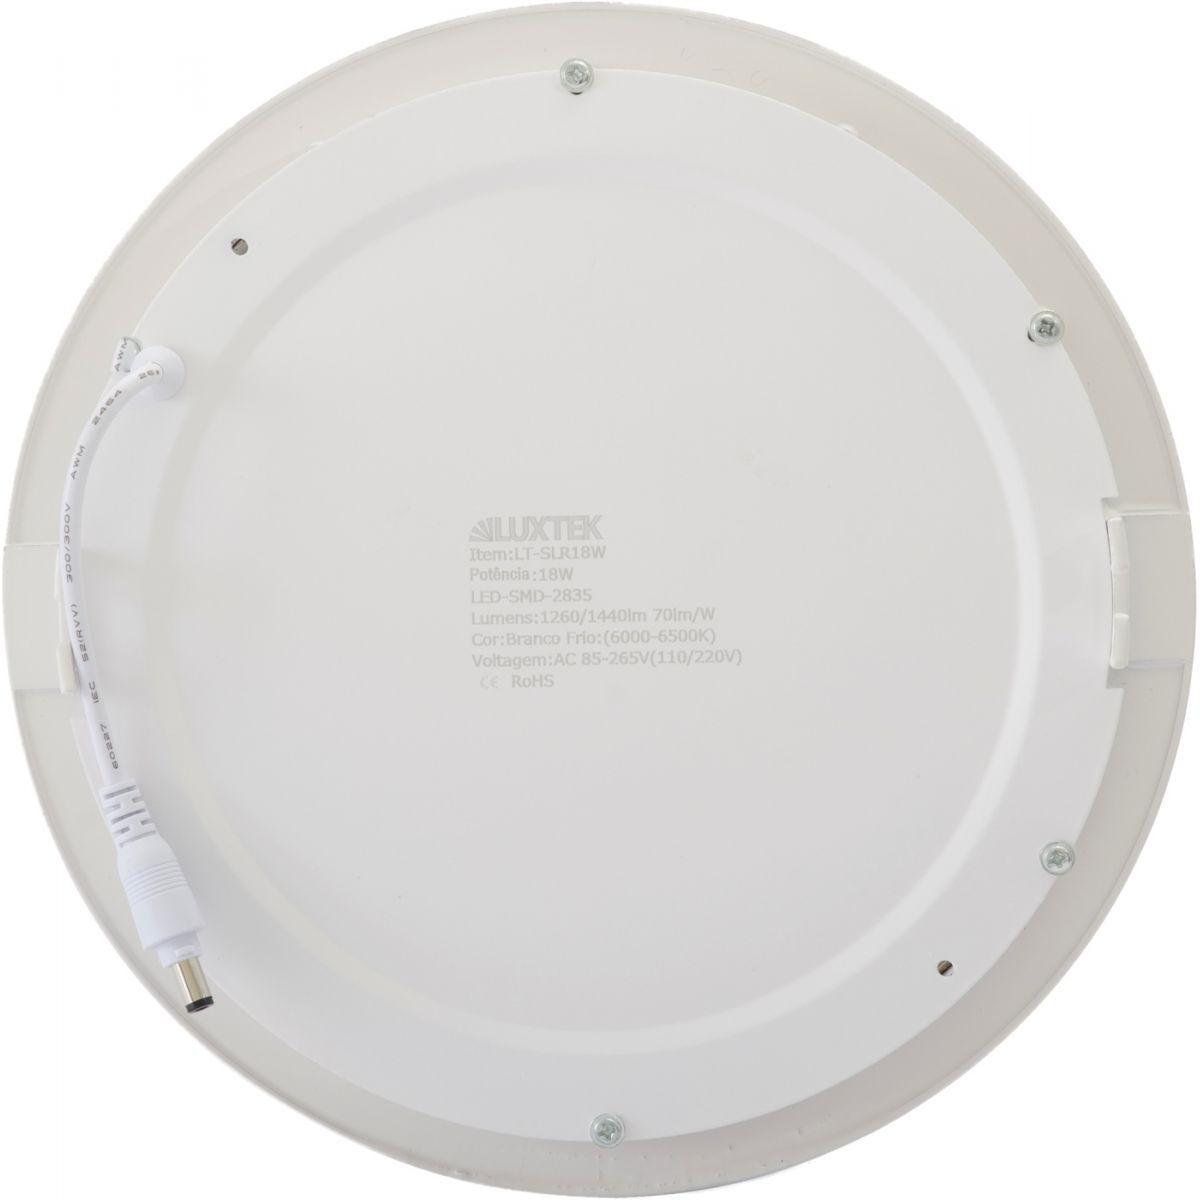 Luminária Plafon LED 18w Embutir Branco Frio Redonda - Luxtek